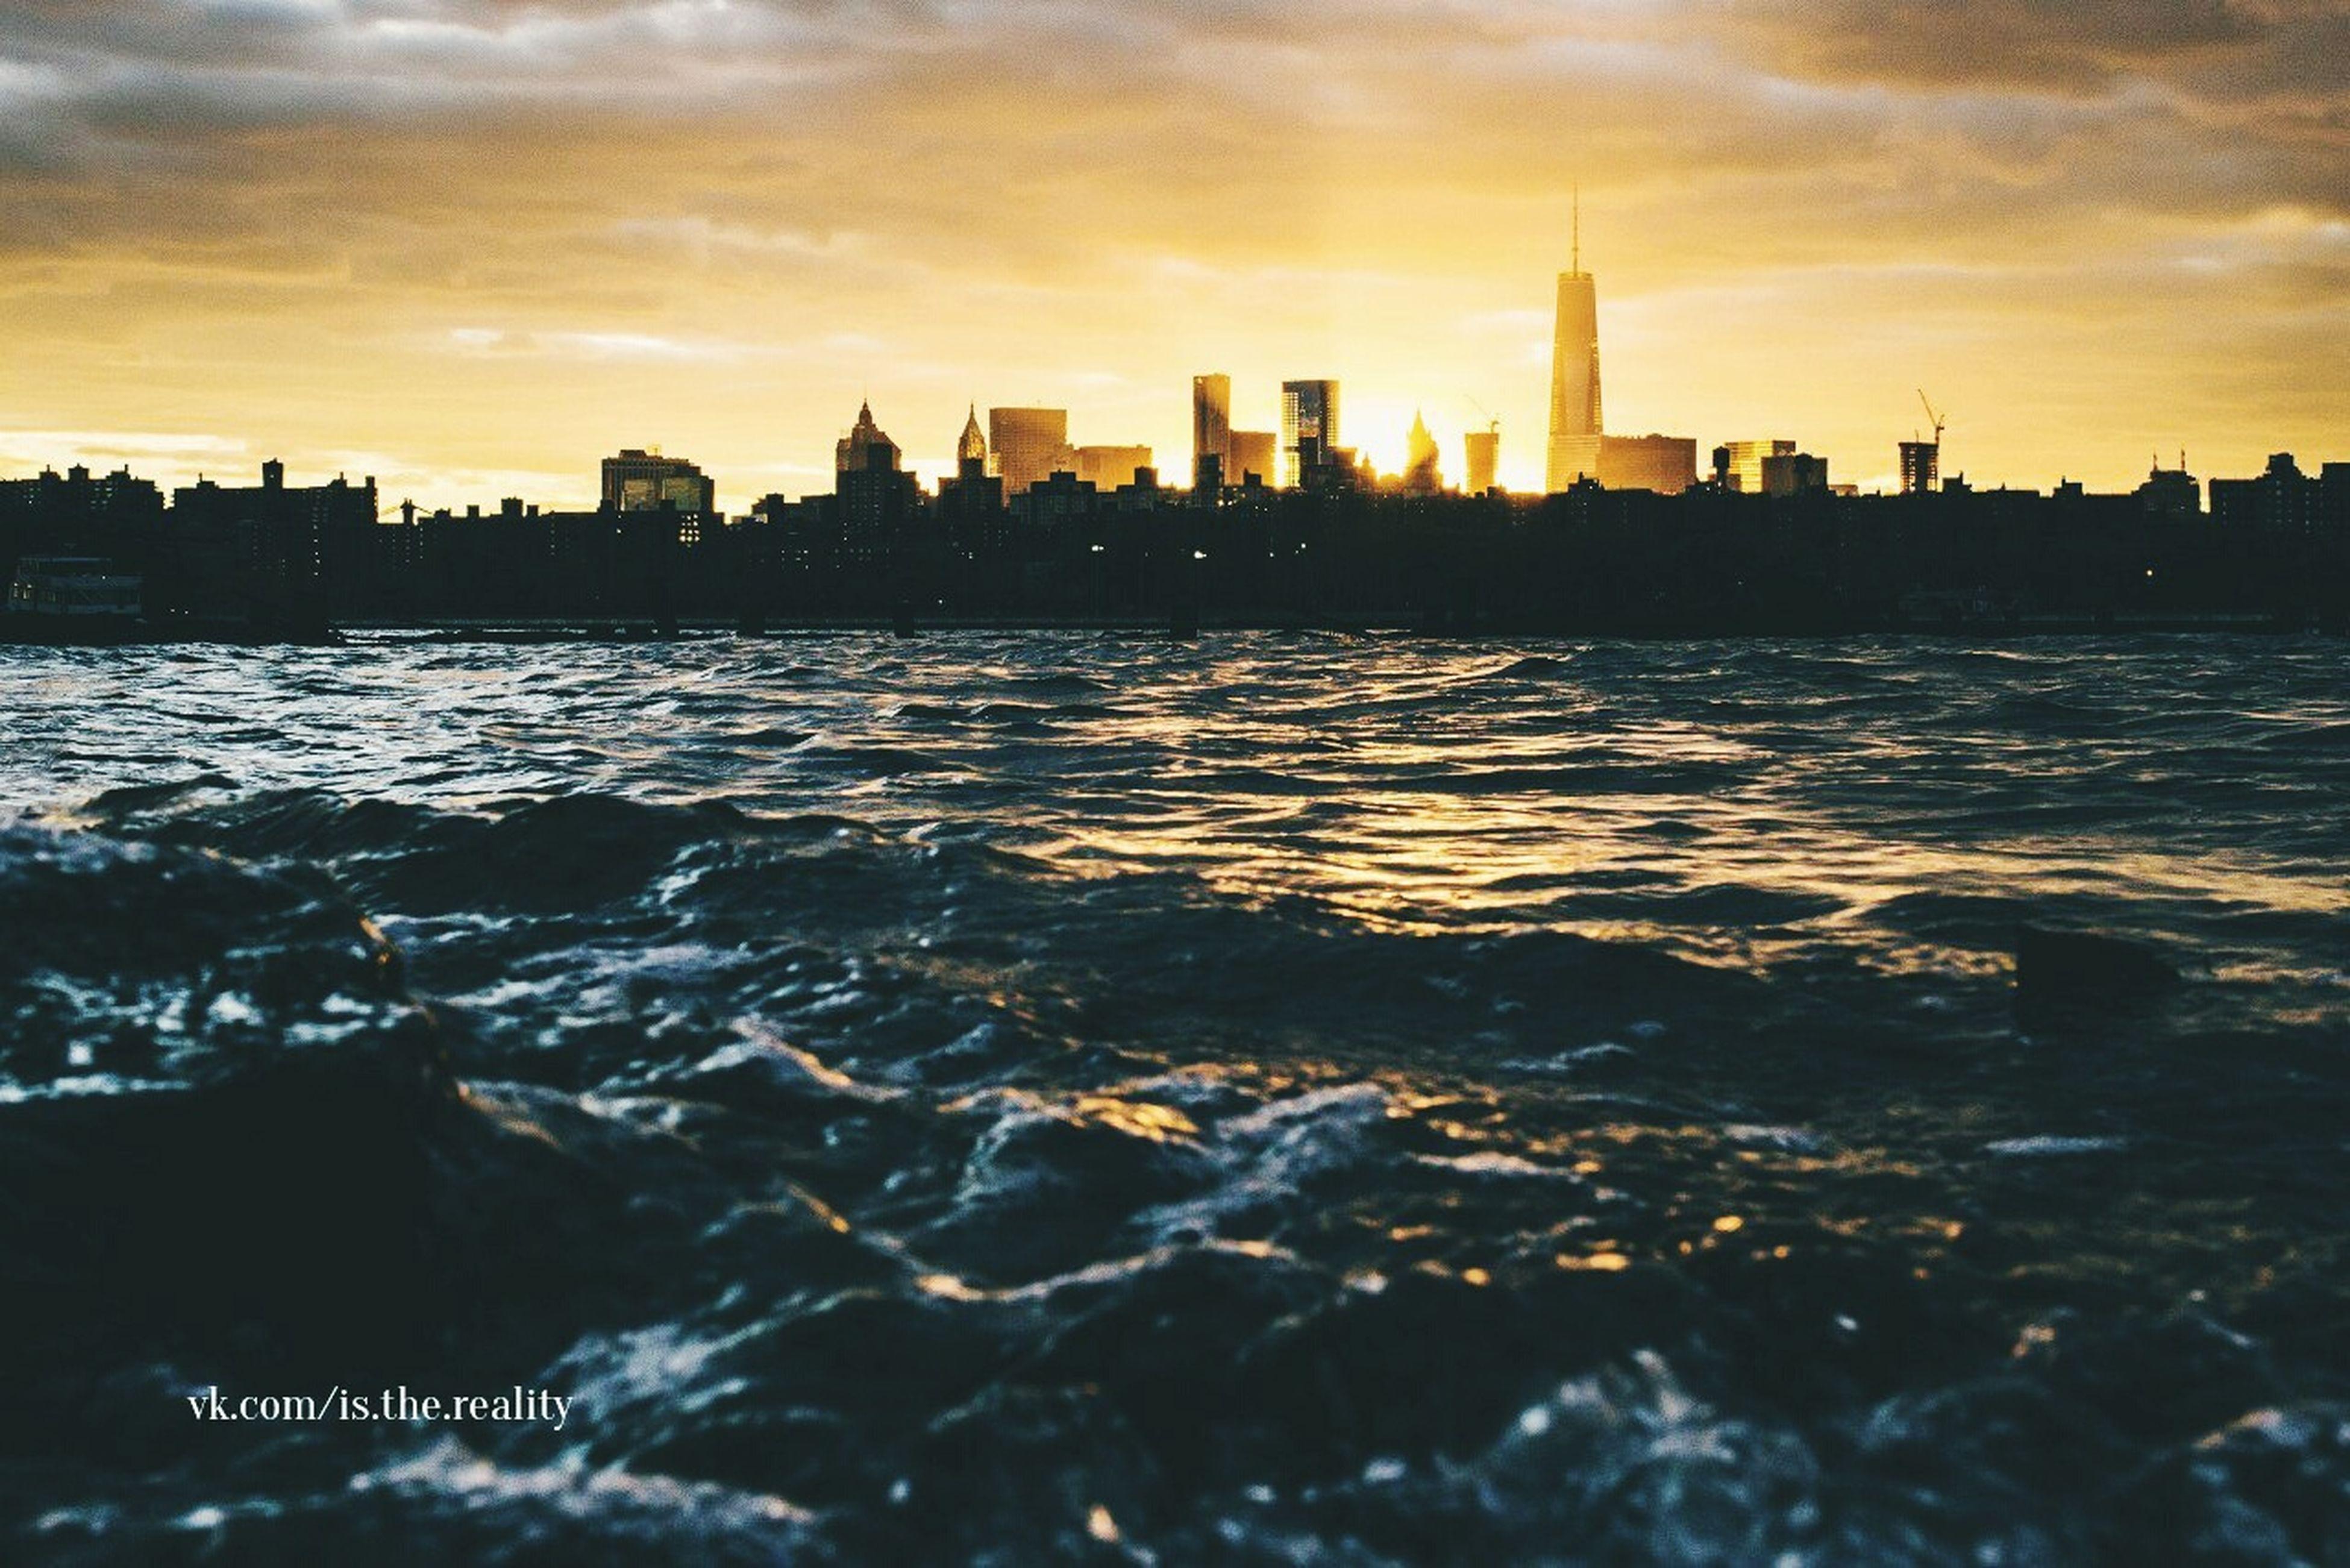 sunset, water, building exterior, architecture, built structure, sky, sea, city, waterfront, silhouette, skyscraper, cityscape, cloud - sky, orange color, urban skyline, tower, scenics, dusk, rippled, river